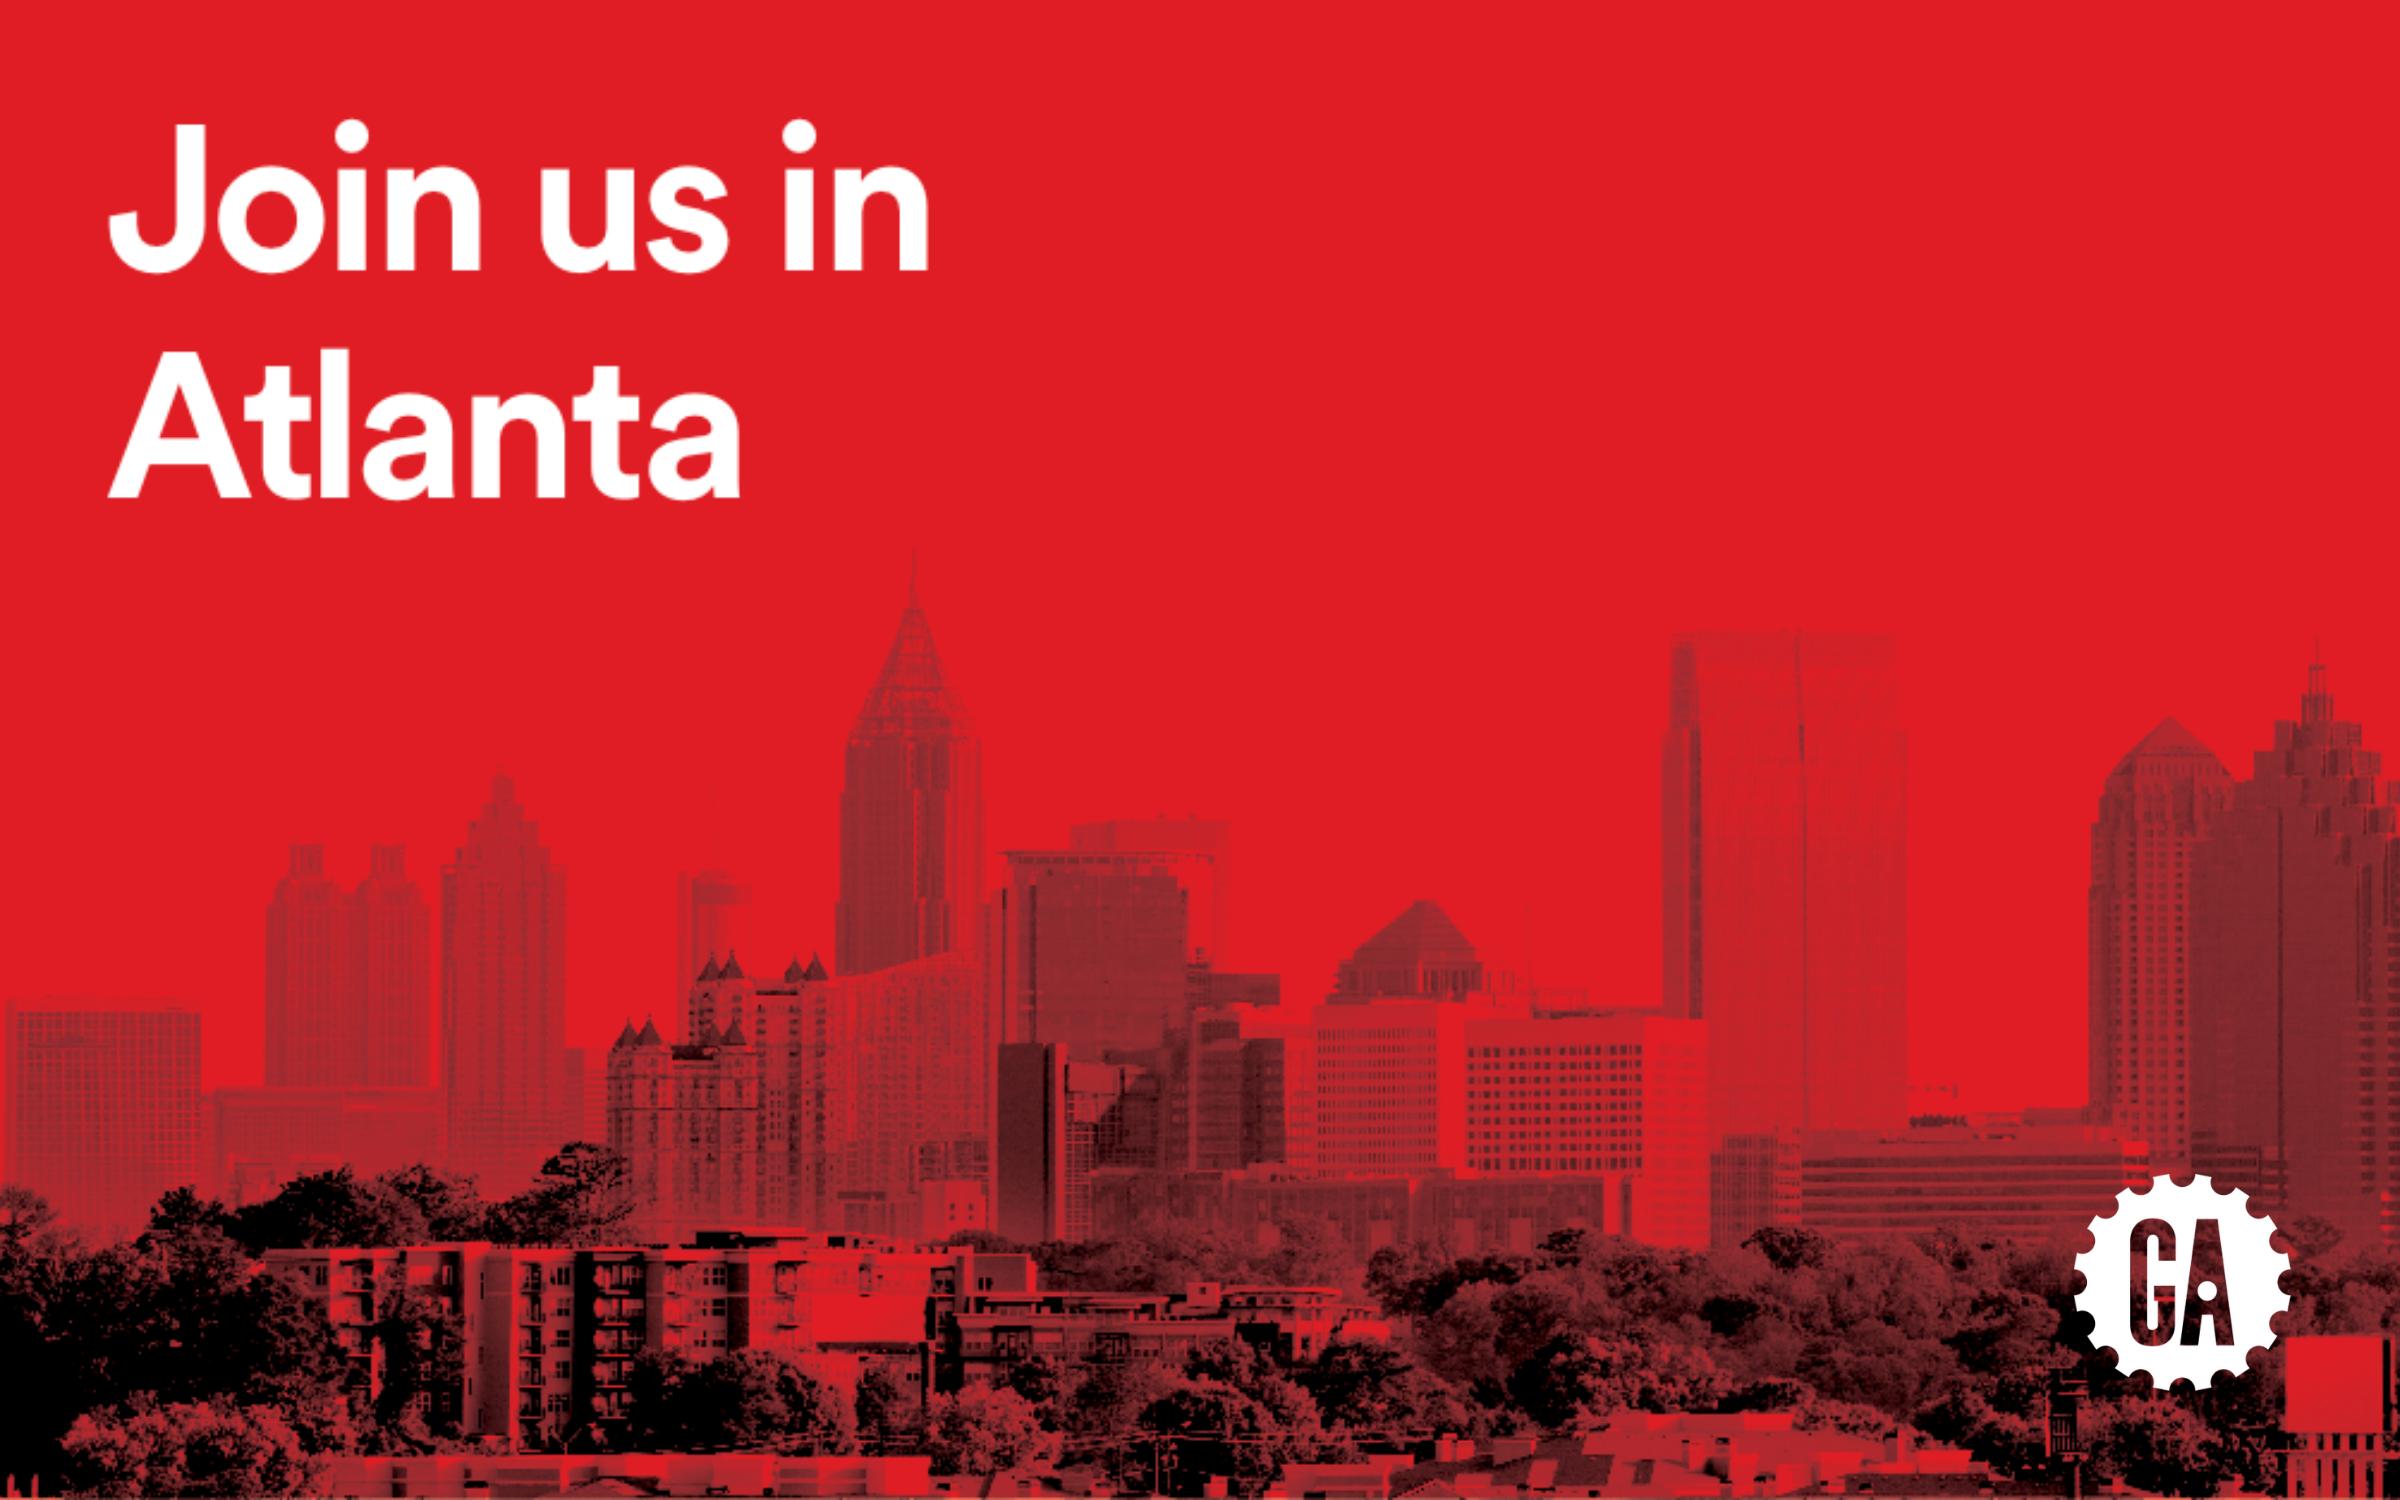 Find Work That Matters: Meet GA's Atlanta Team